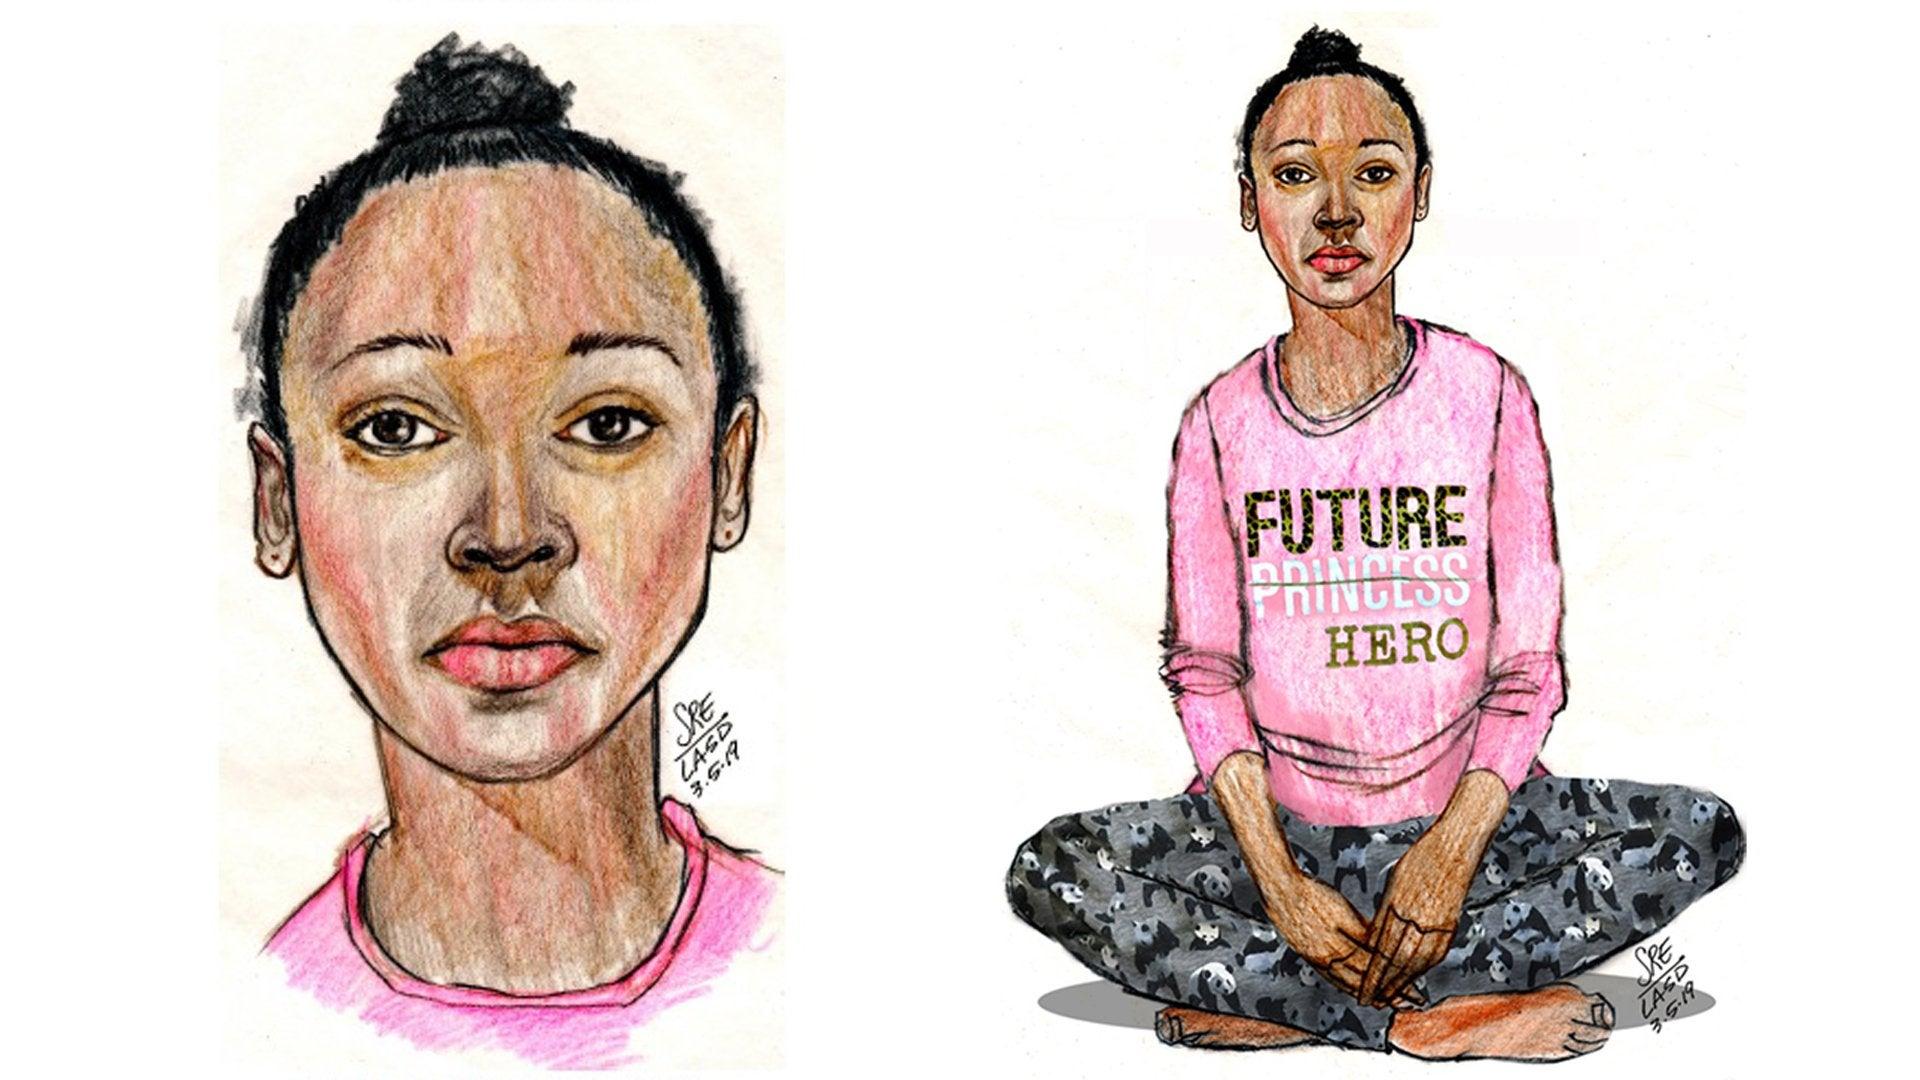 Body of Unidentified Black Girl found in a Bag in California